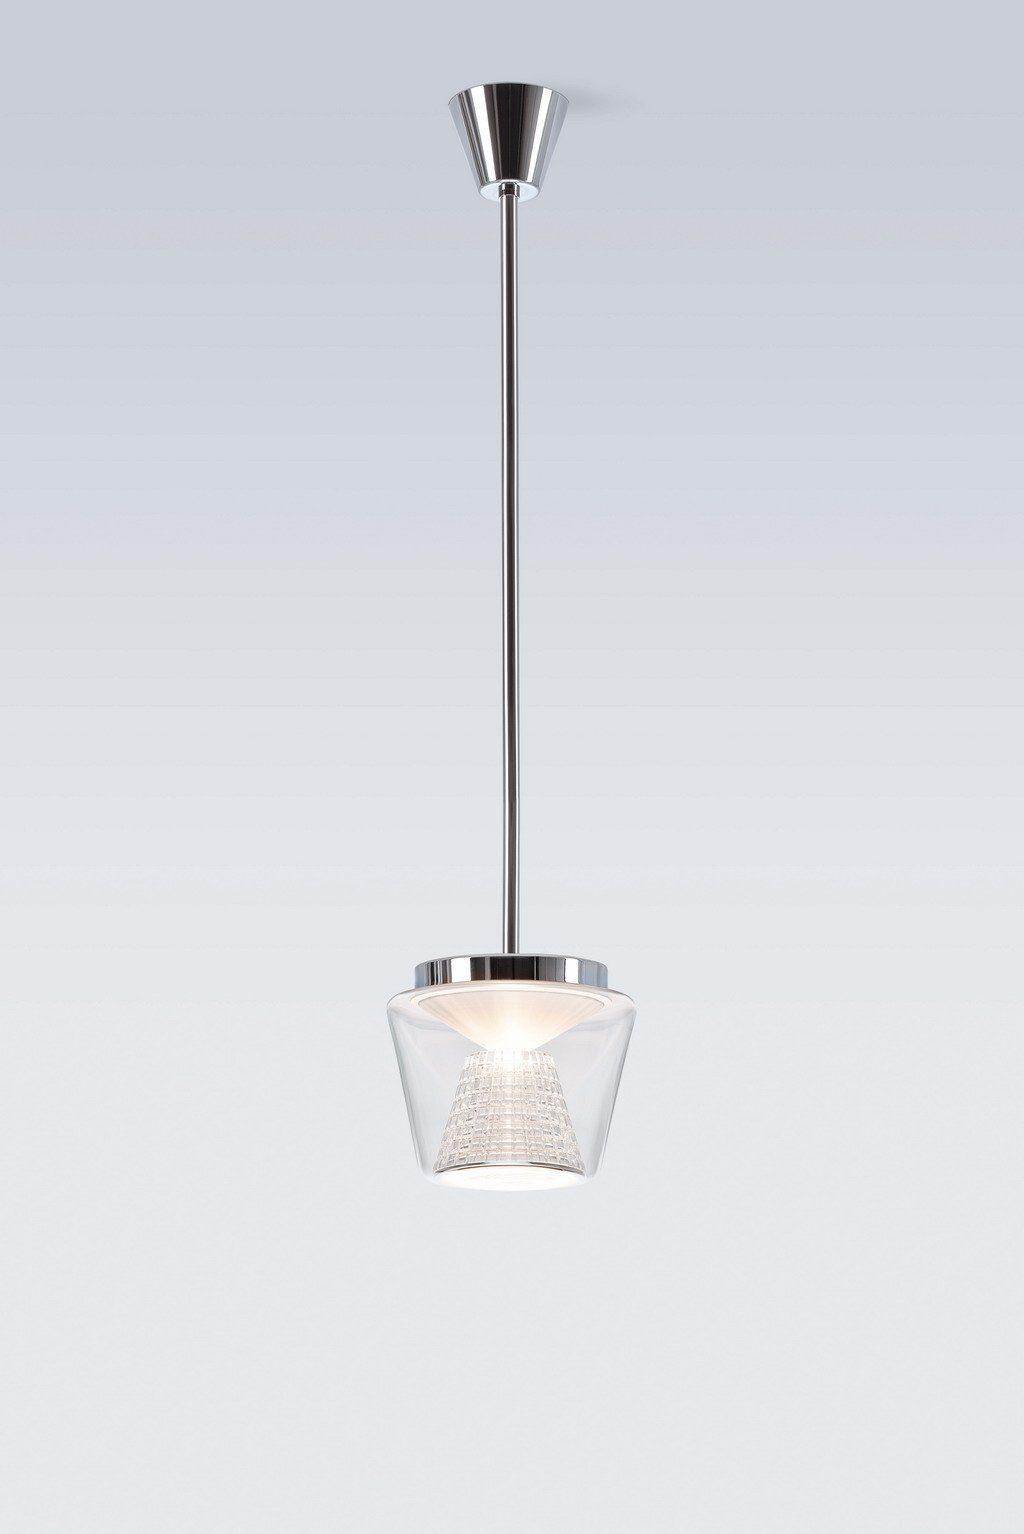 Serien Lighting Pendelleuchte Annex LED Suspension Kristallglas - Pendelleuchten Innen